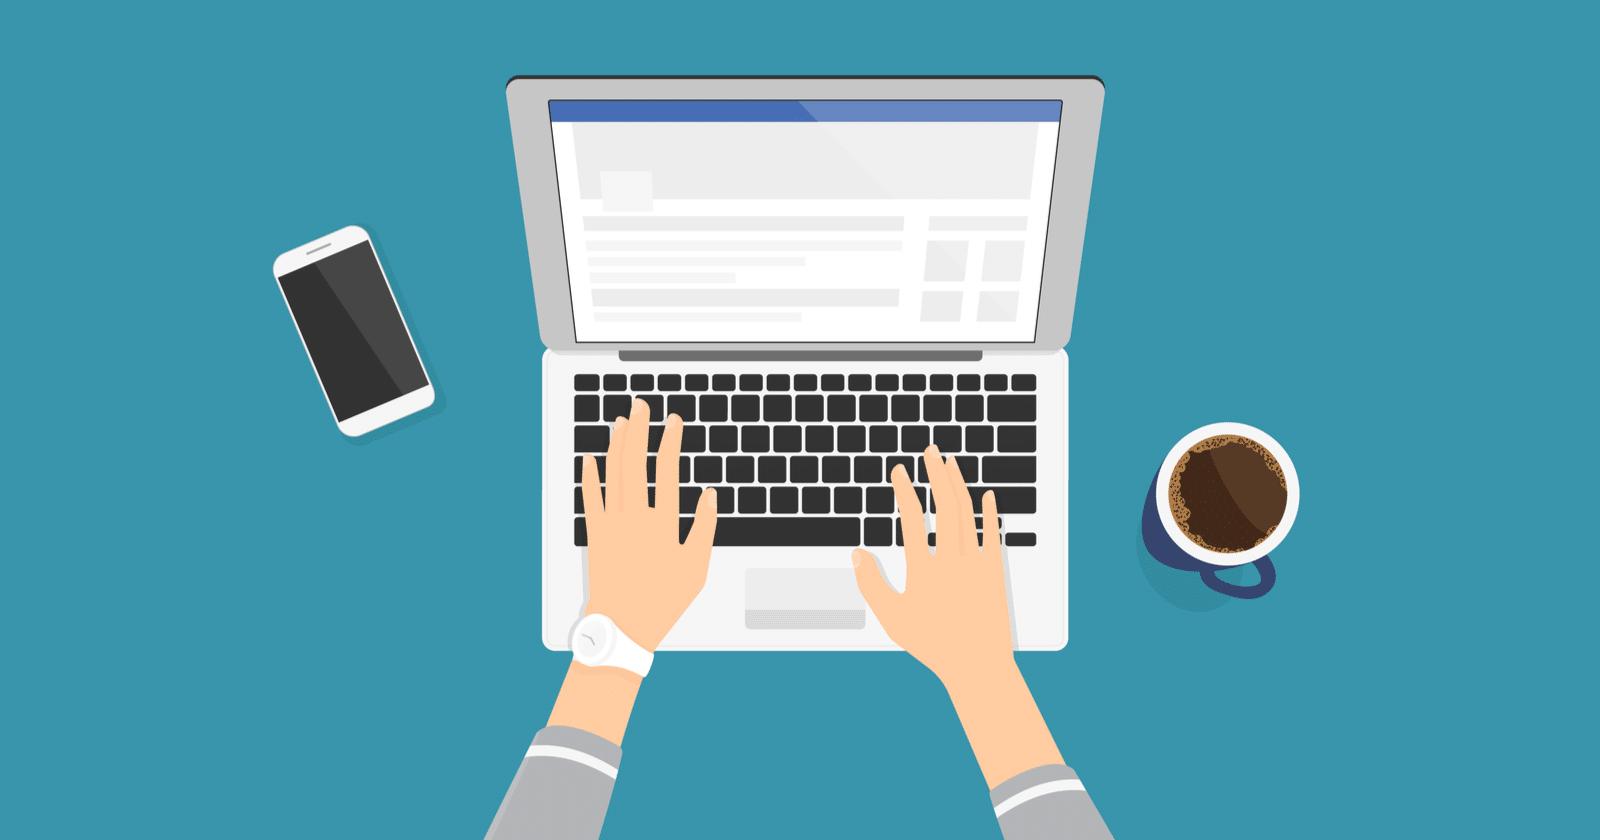 3 Top Skills SEO Content Writers Need to Succeed via @krisjonescom